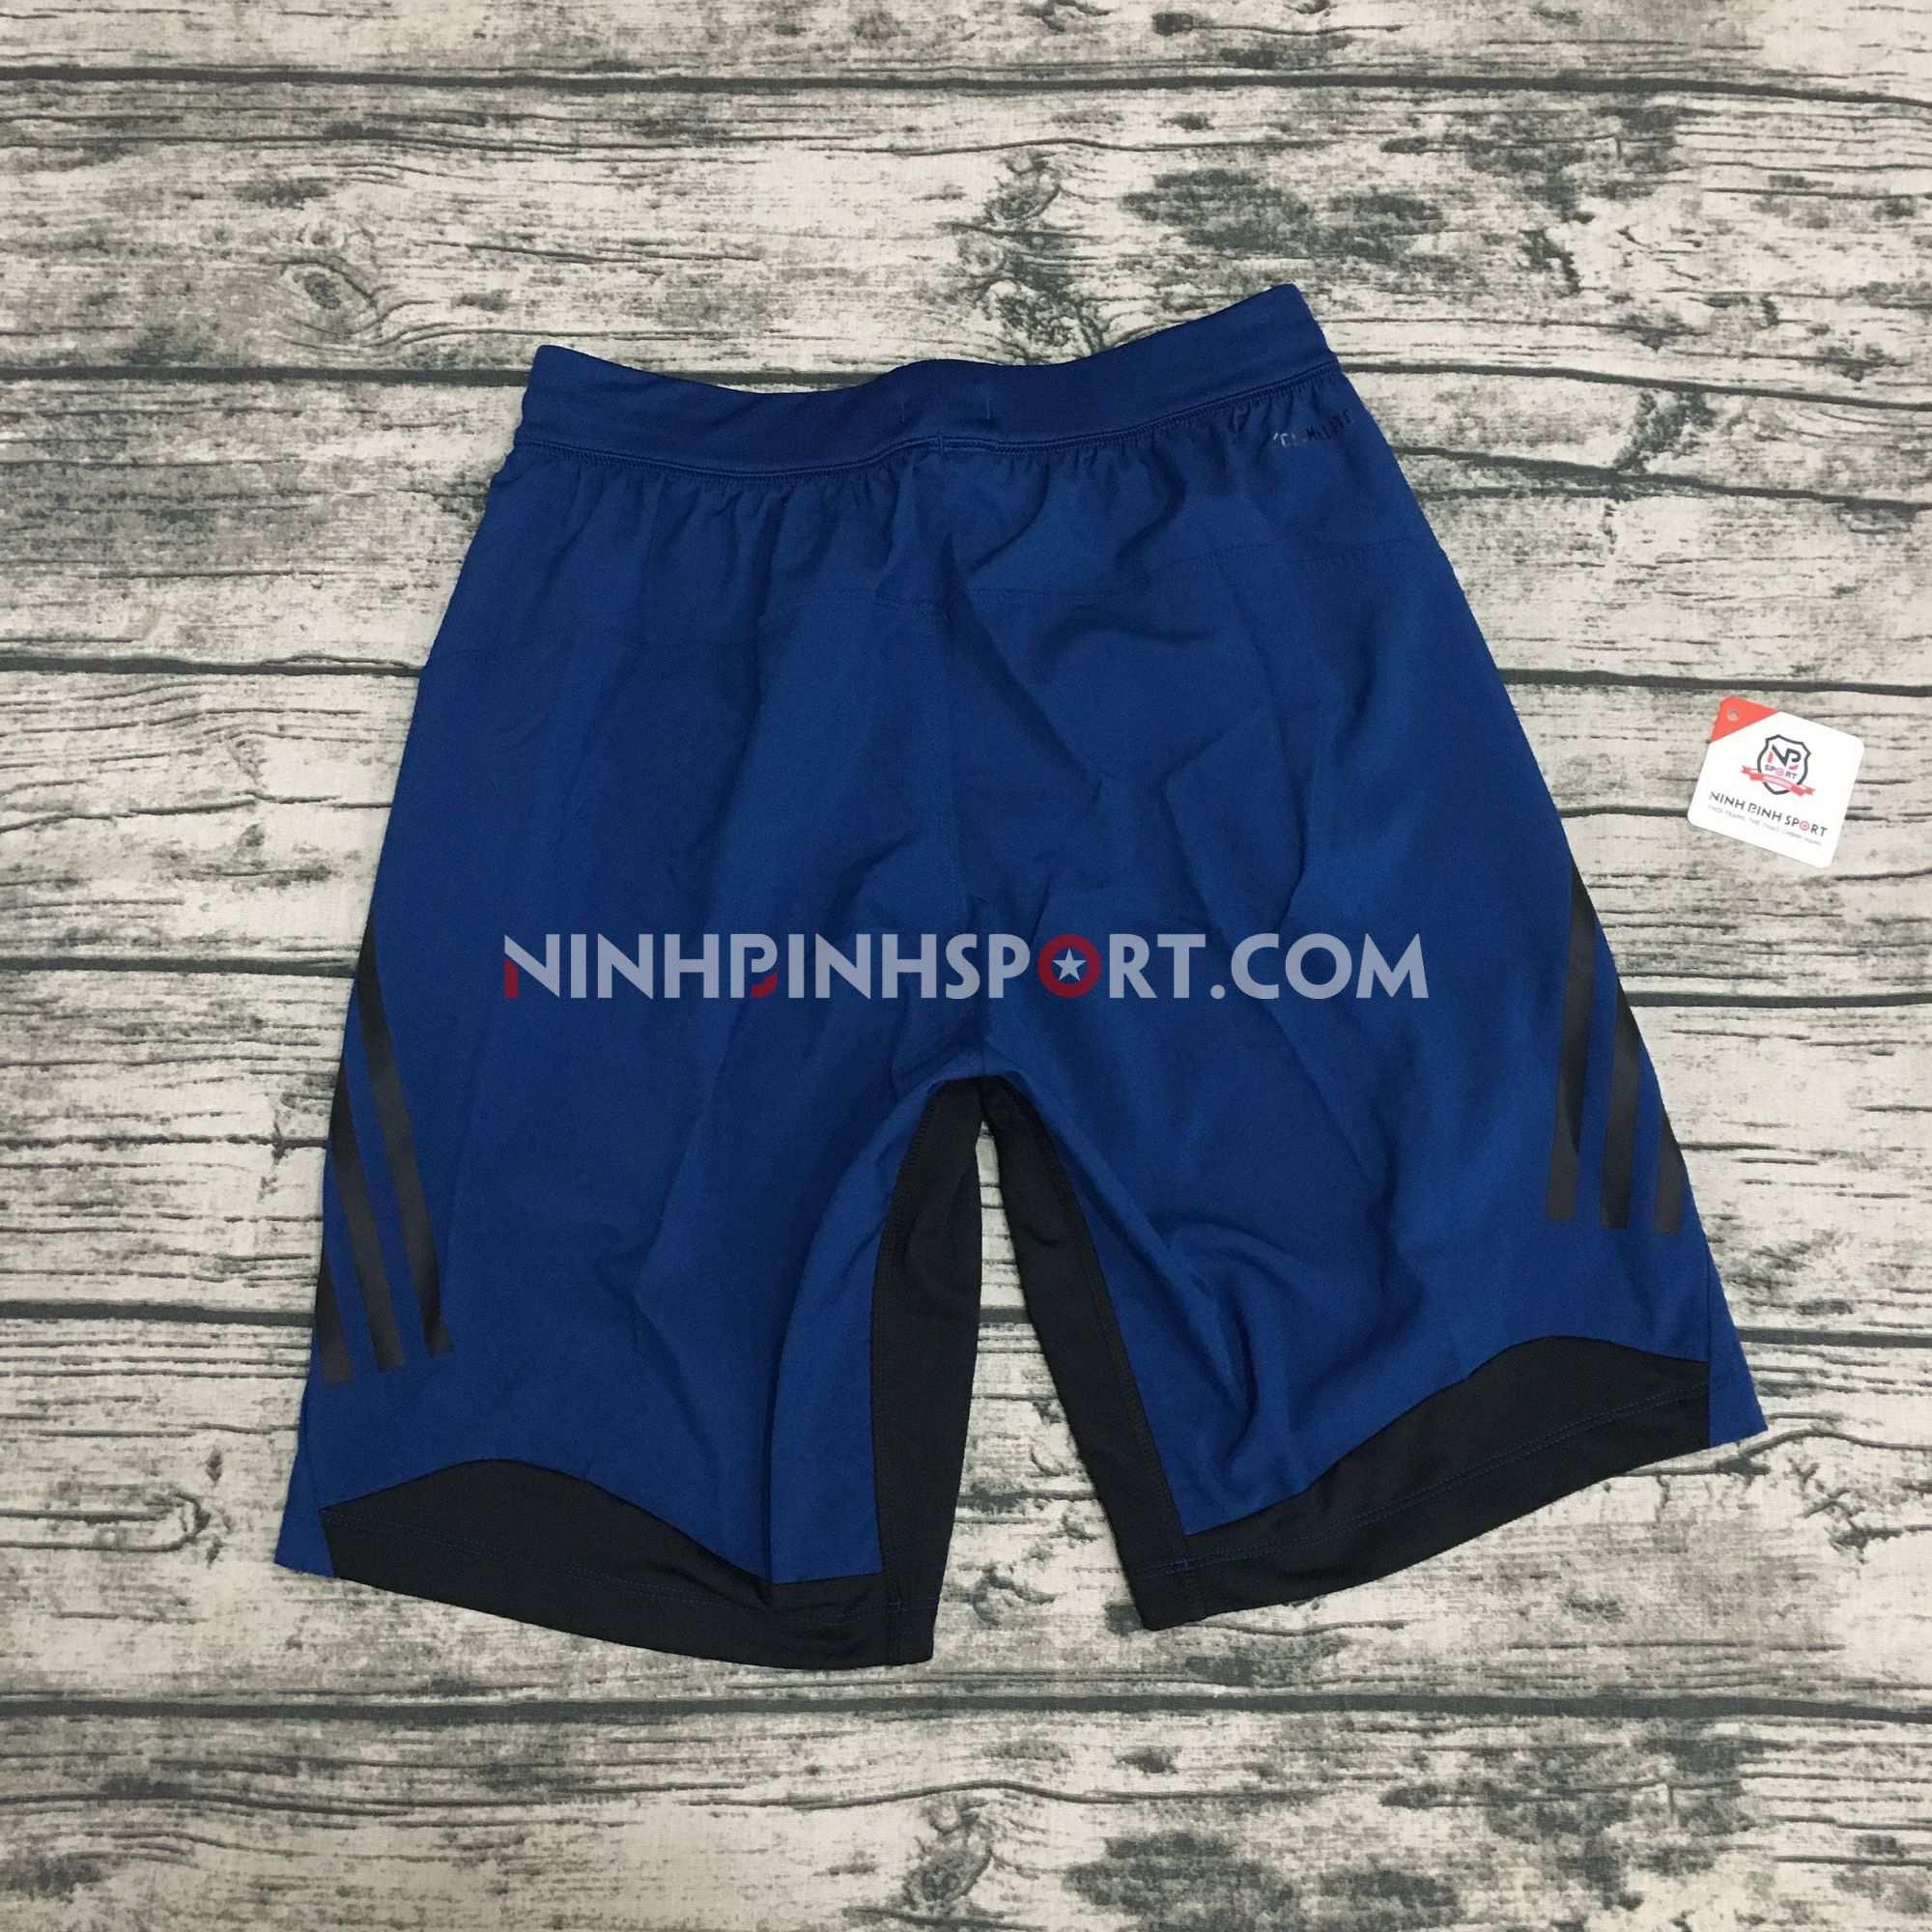 Quần thể thao nam Adidas 4KRFT Tech Woven 3-Stripes Blue DU1566